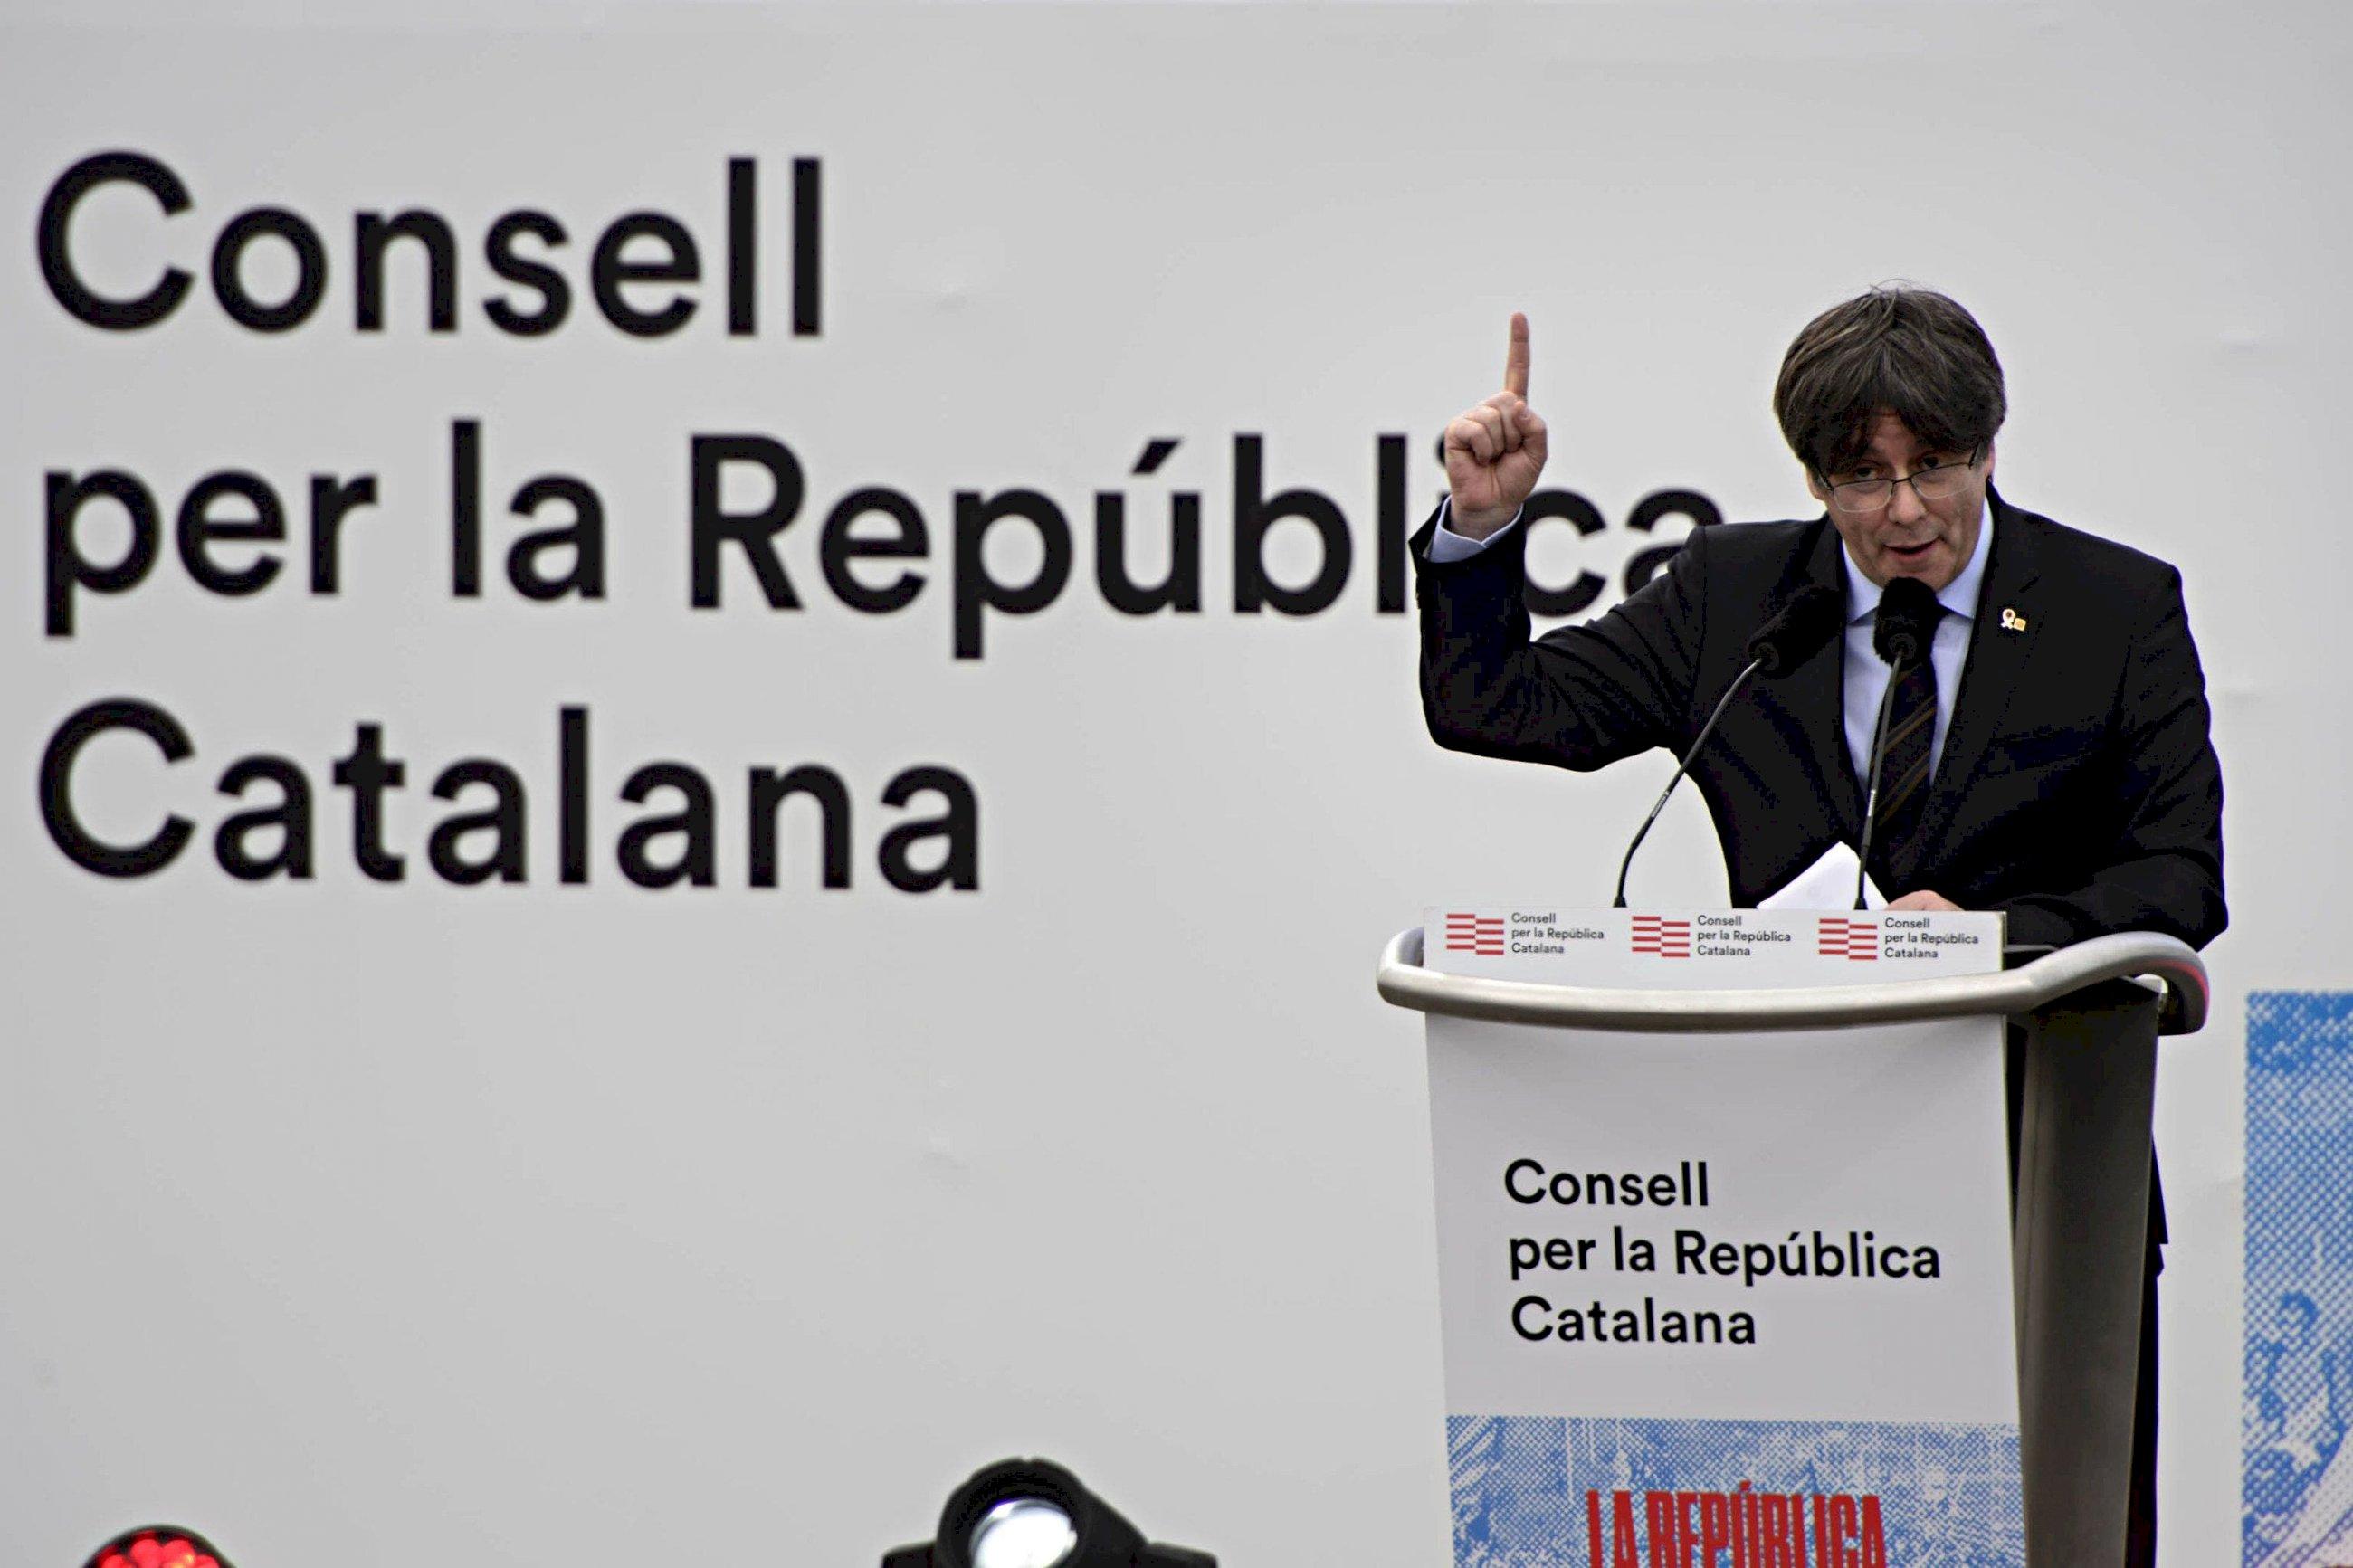 El expresidente fugado de la Generalitat, Carles Puigdemont, en el acto del Consell per la República de Perpinyà (Francia), en febrero de 2020 | ANC/Archivo